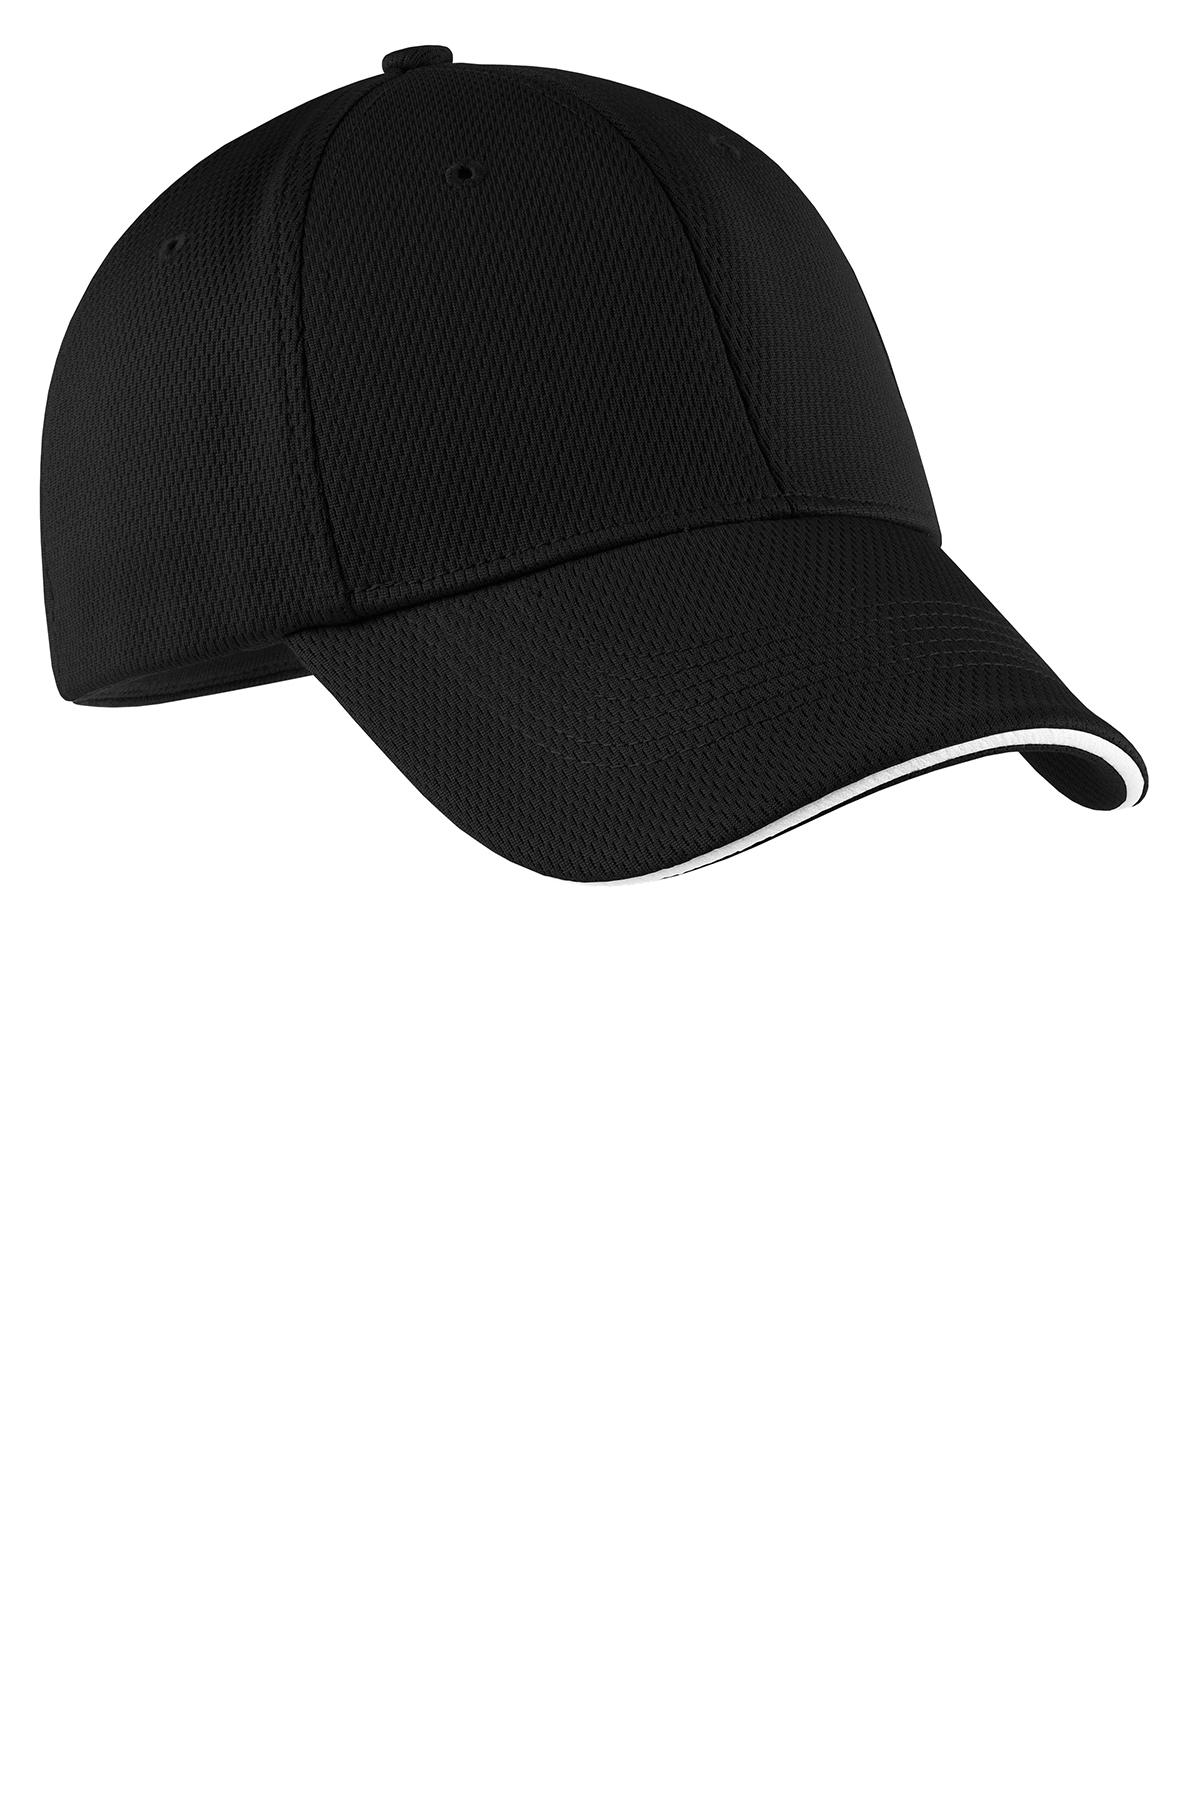 5ba54dce7d1 Nike Dri-FIT Mesh Swoosh Flex Sandwich Cap. Brand Logo